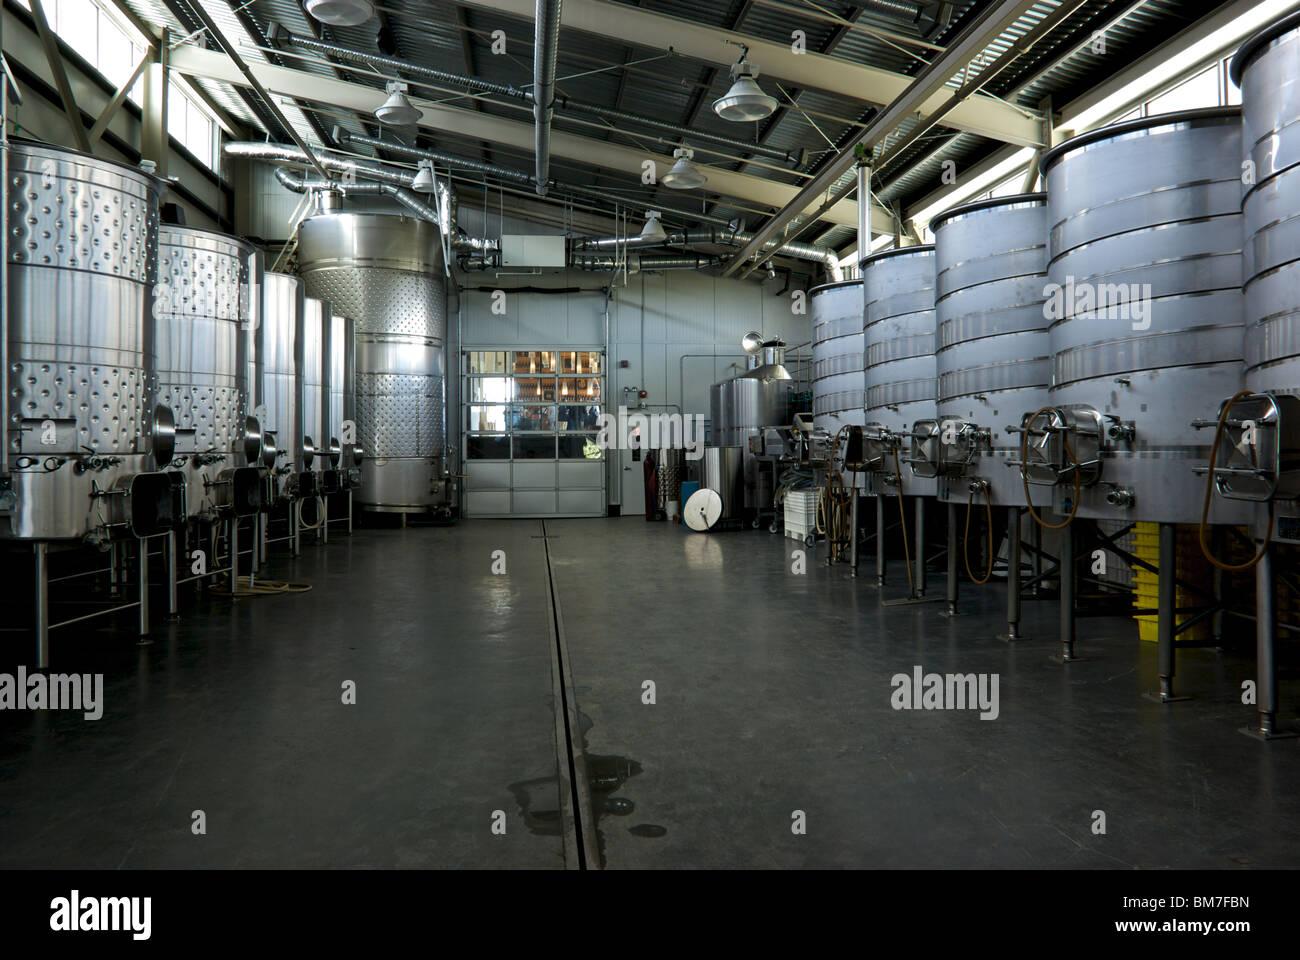 Enormous Wine Cellar : Huge empty stainless steel wine fermentation tanks in